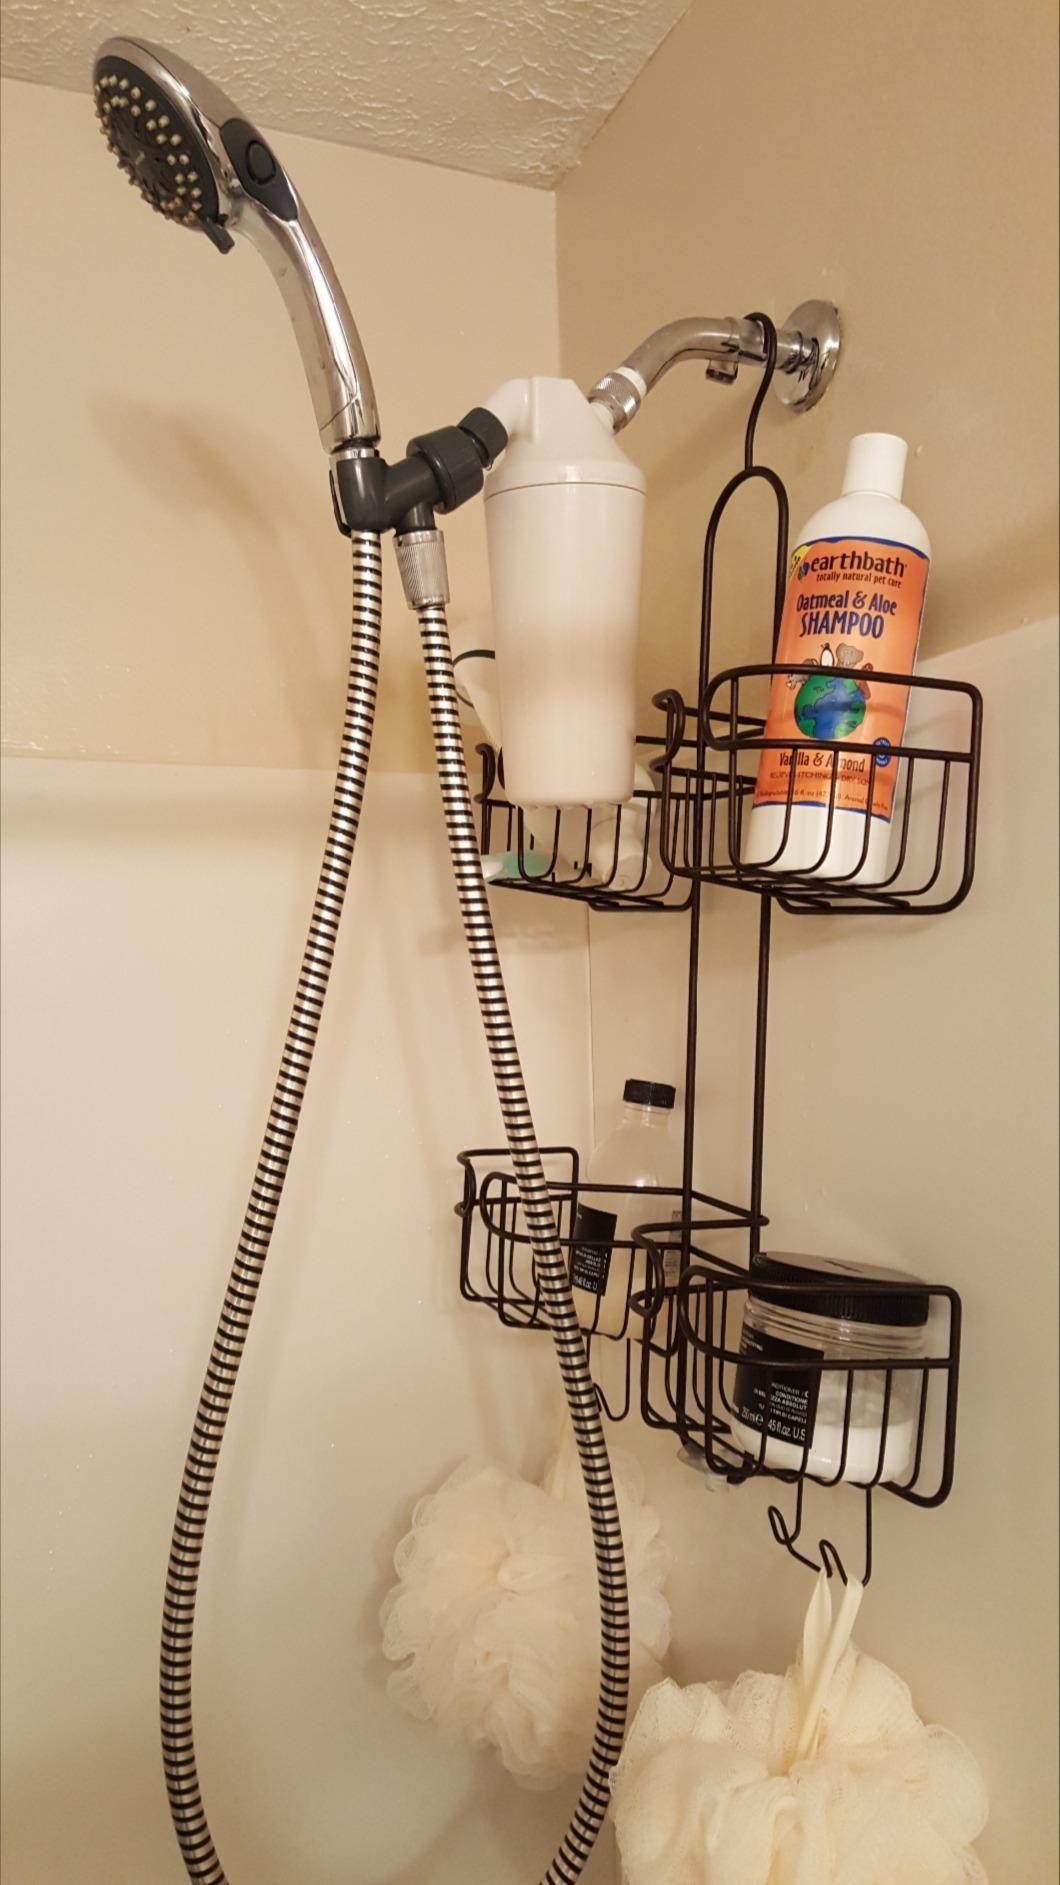 Best Shower Filter Reviews Best Shower Filter Chlorine Shower Filter Shower Filter